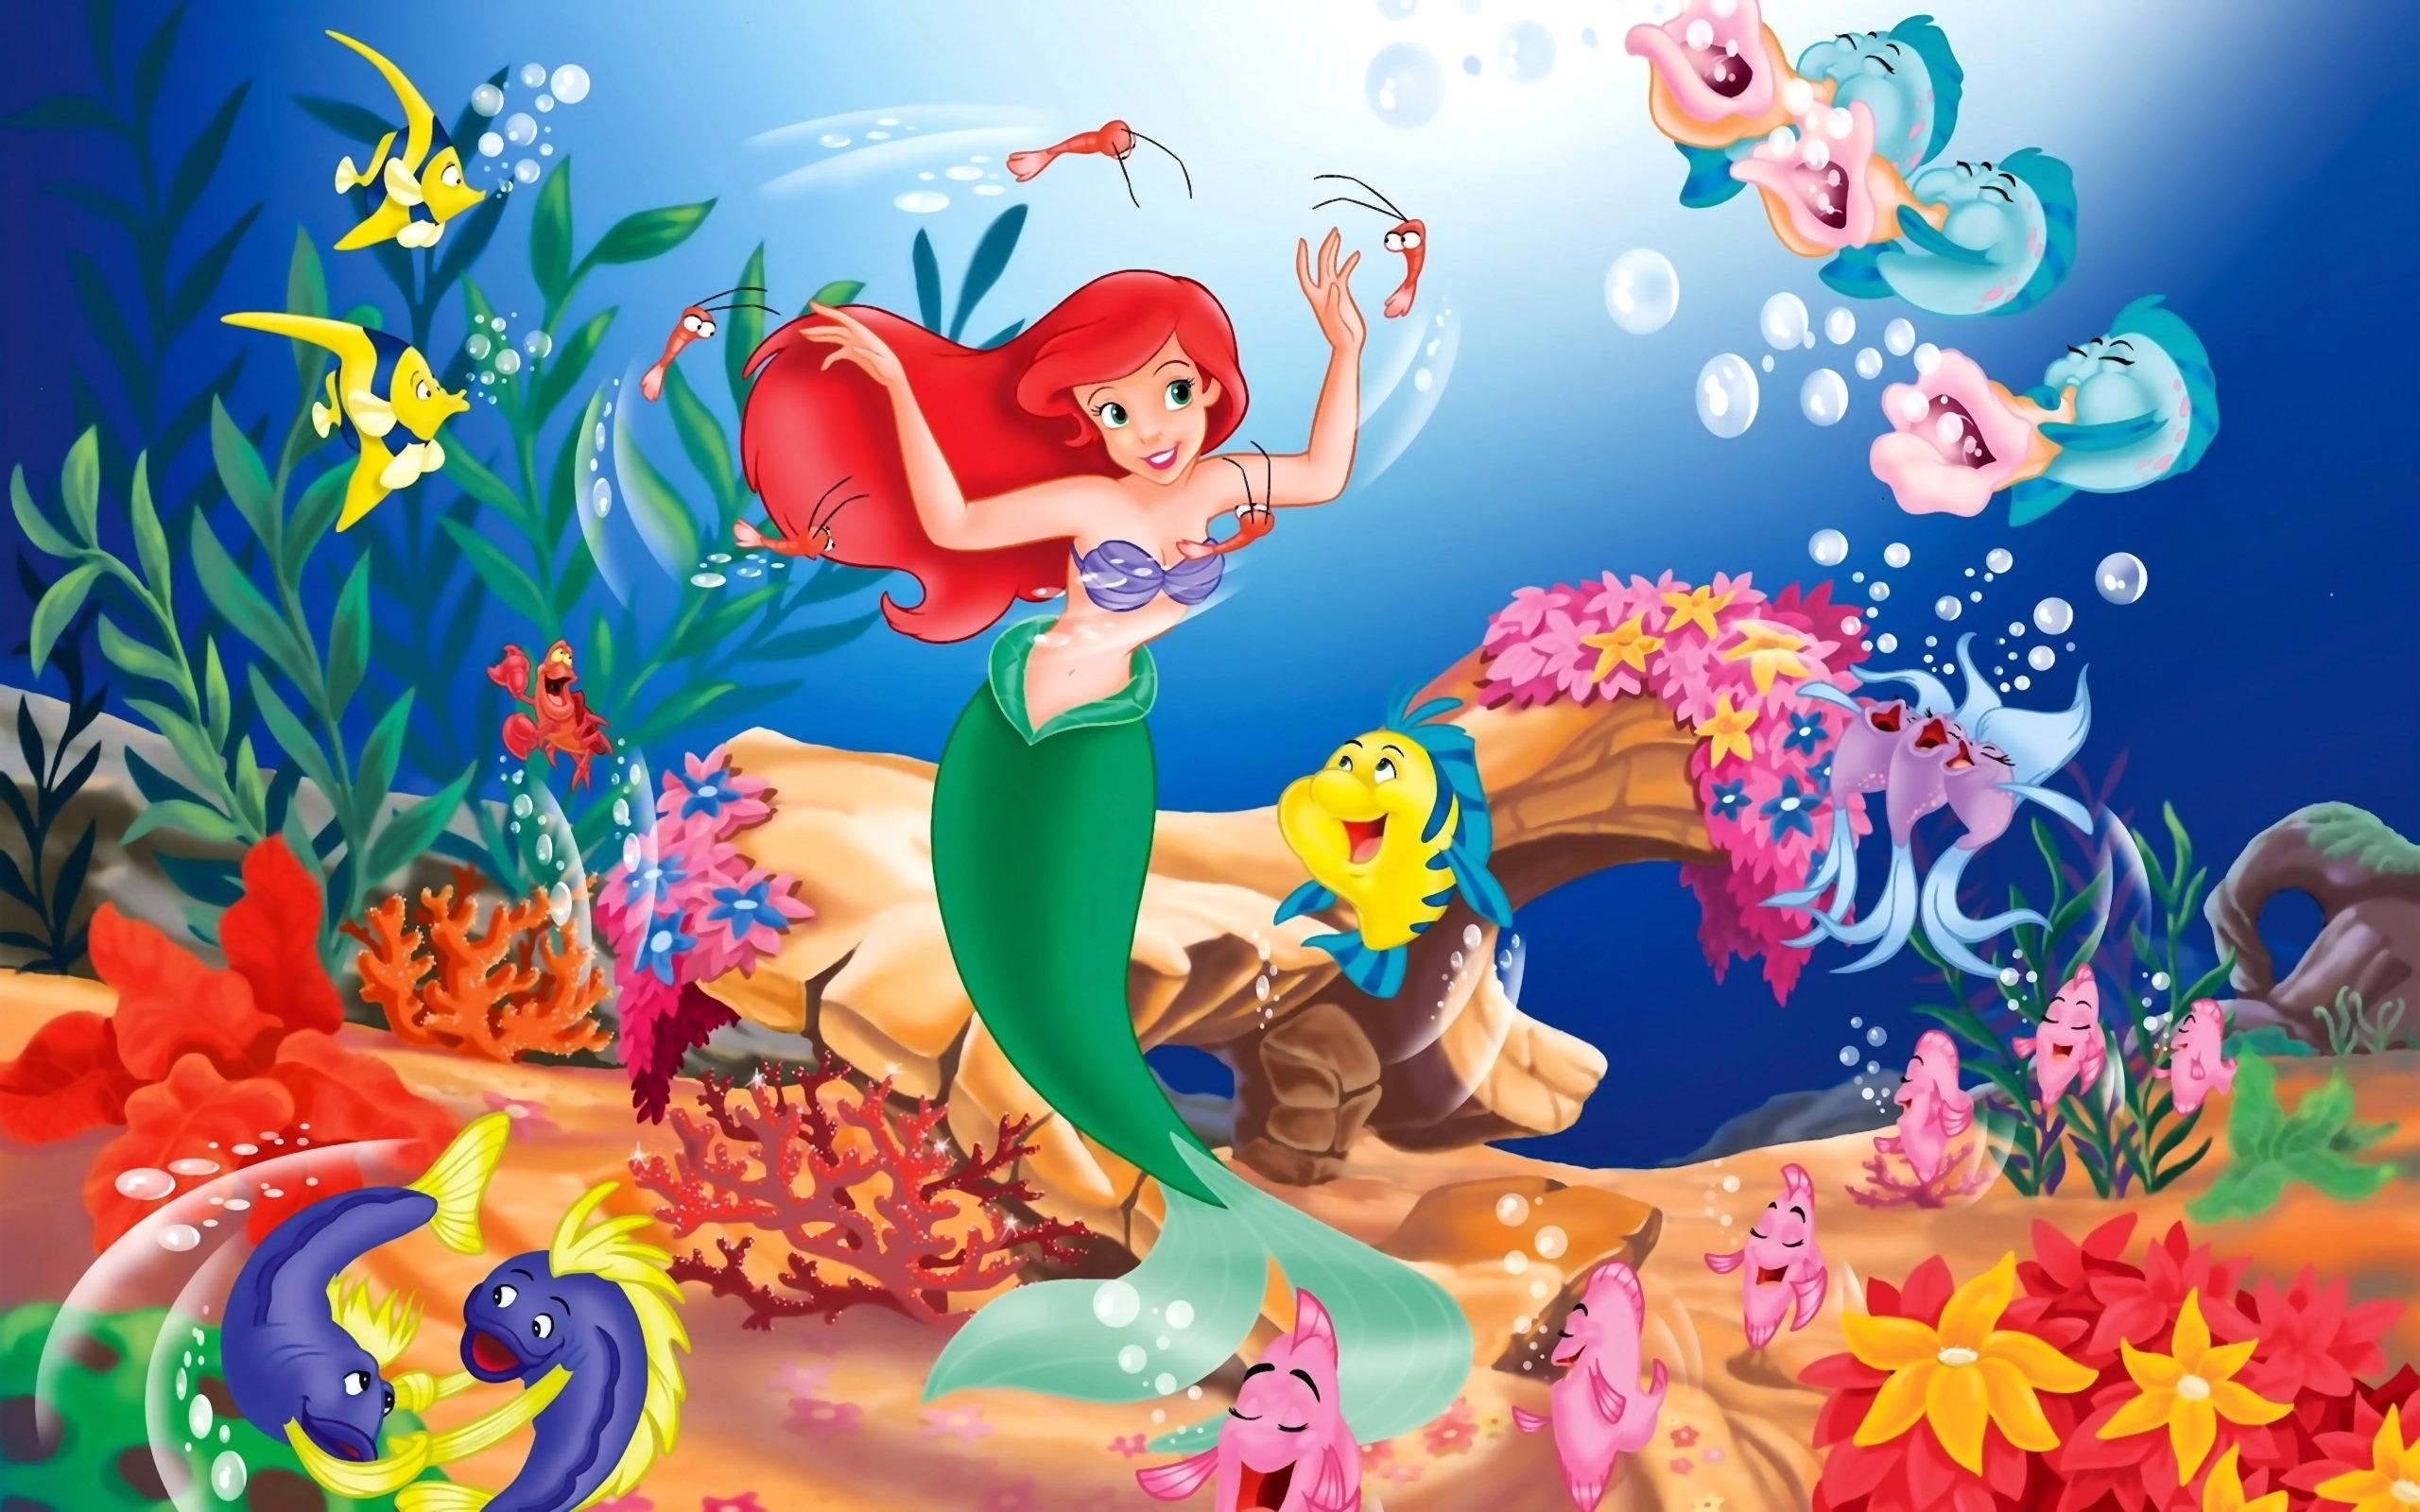 disney the little mermaid wallpapers | hd wallpapers | id #11047